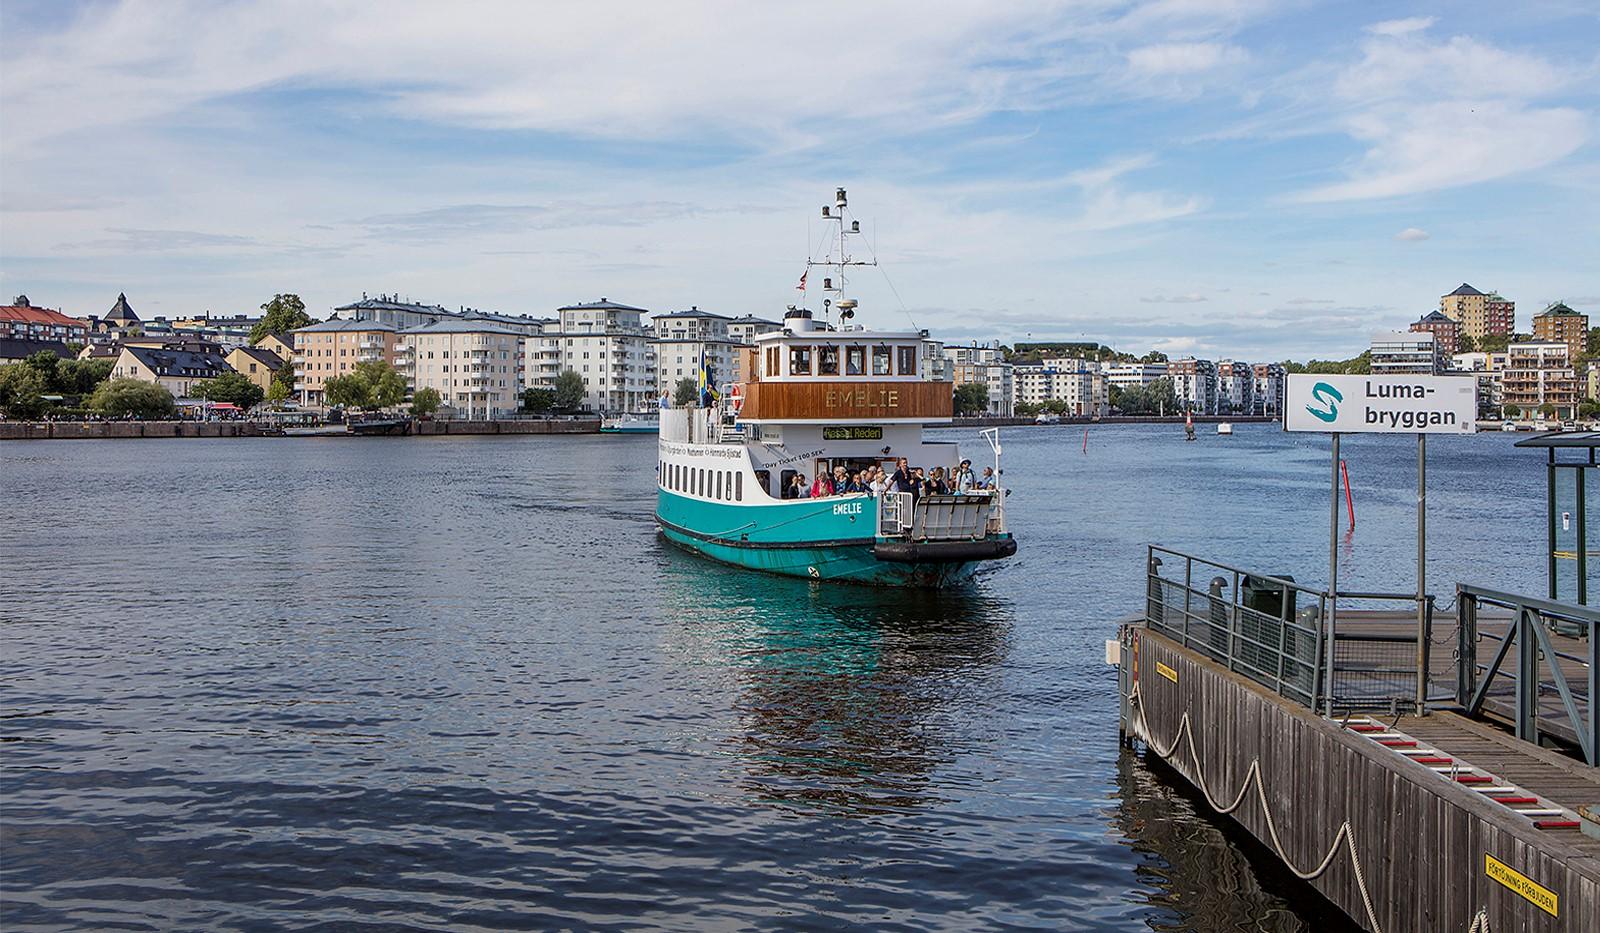 Korphoppsgatan 20 - Ta båten till city!